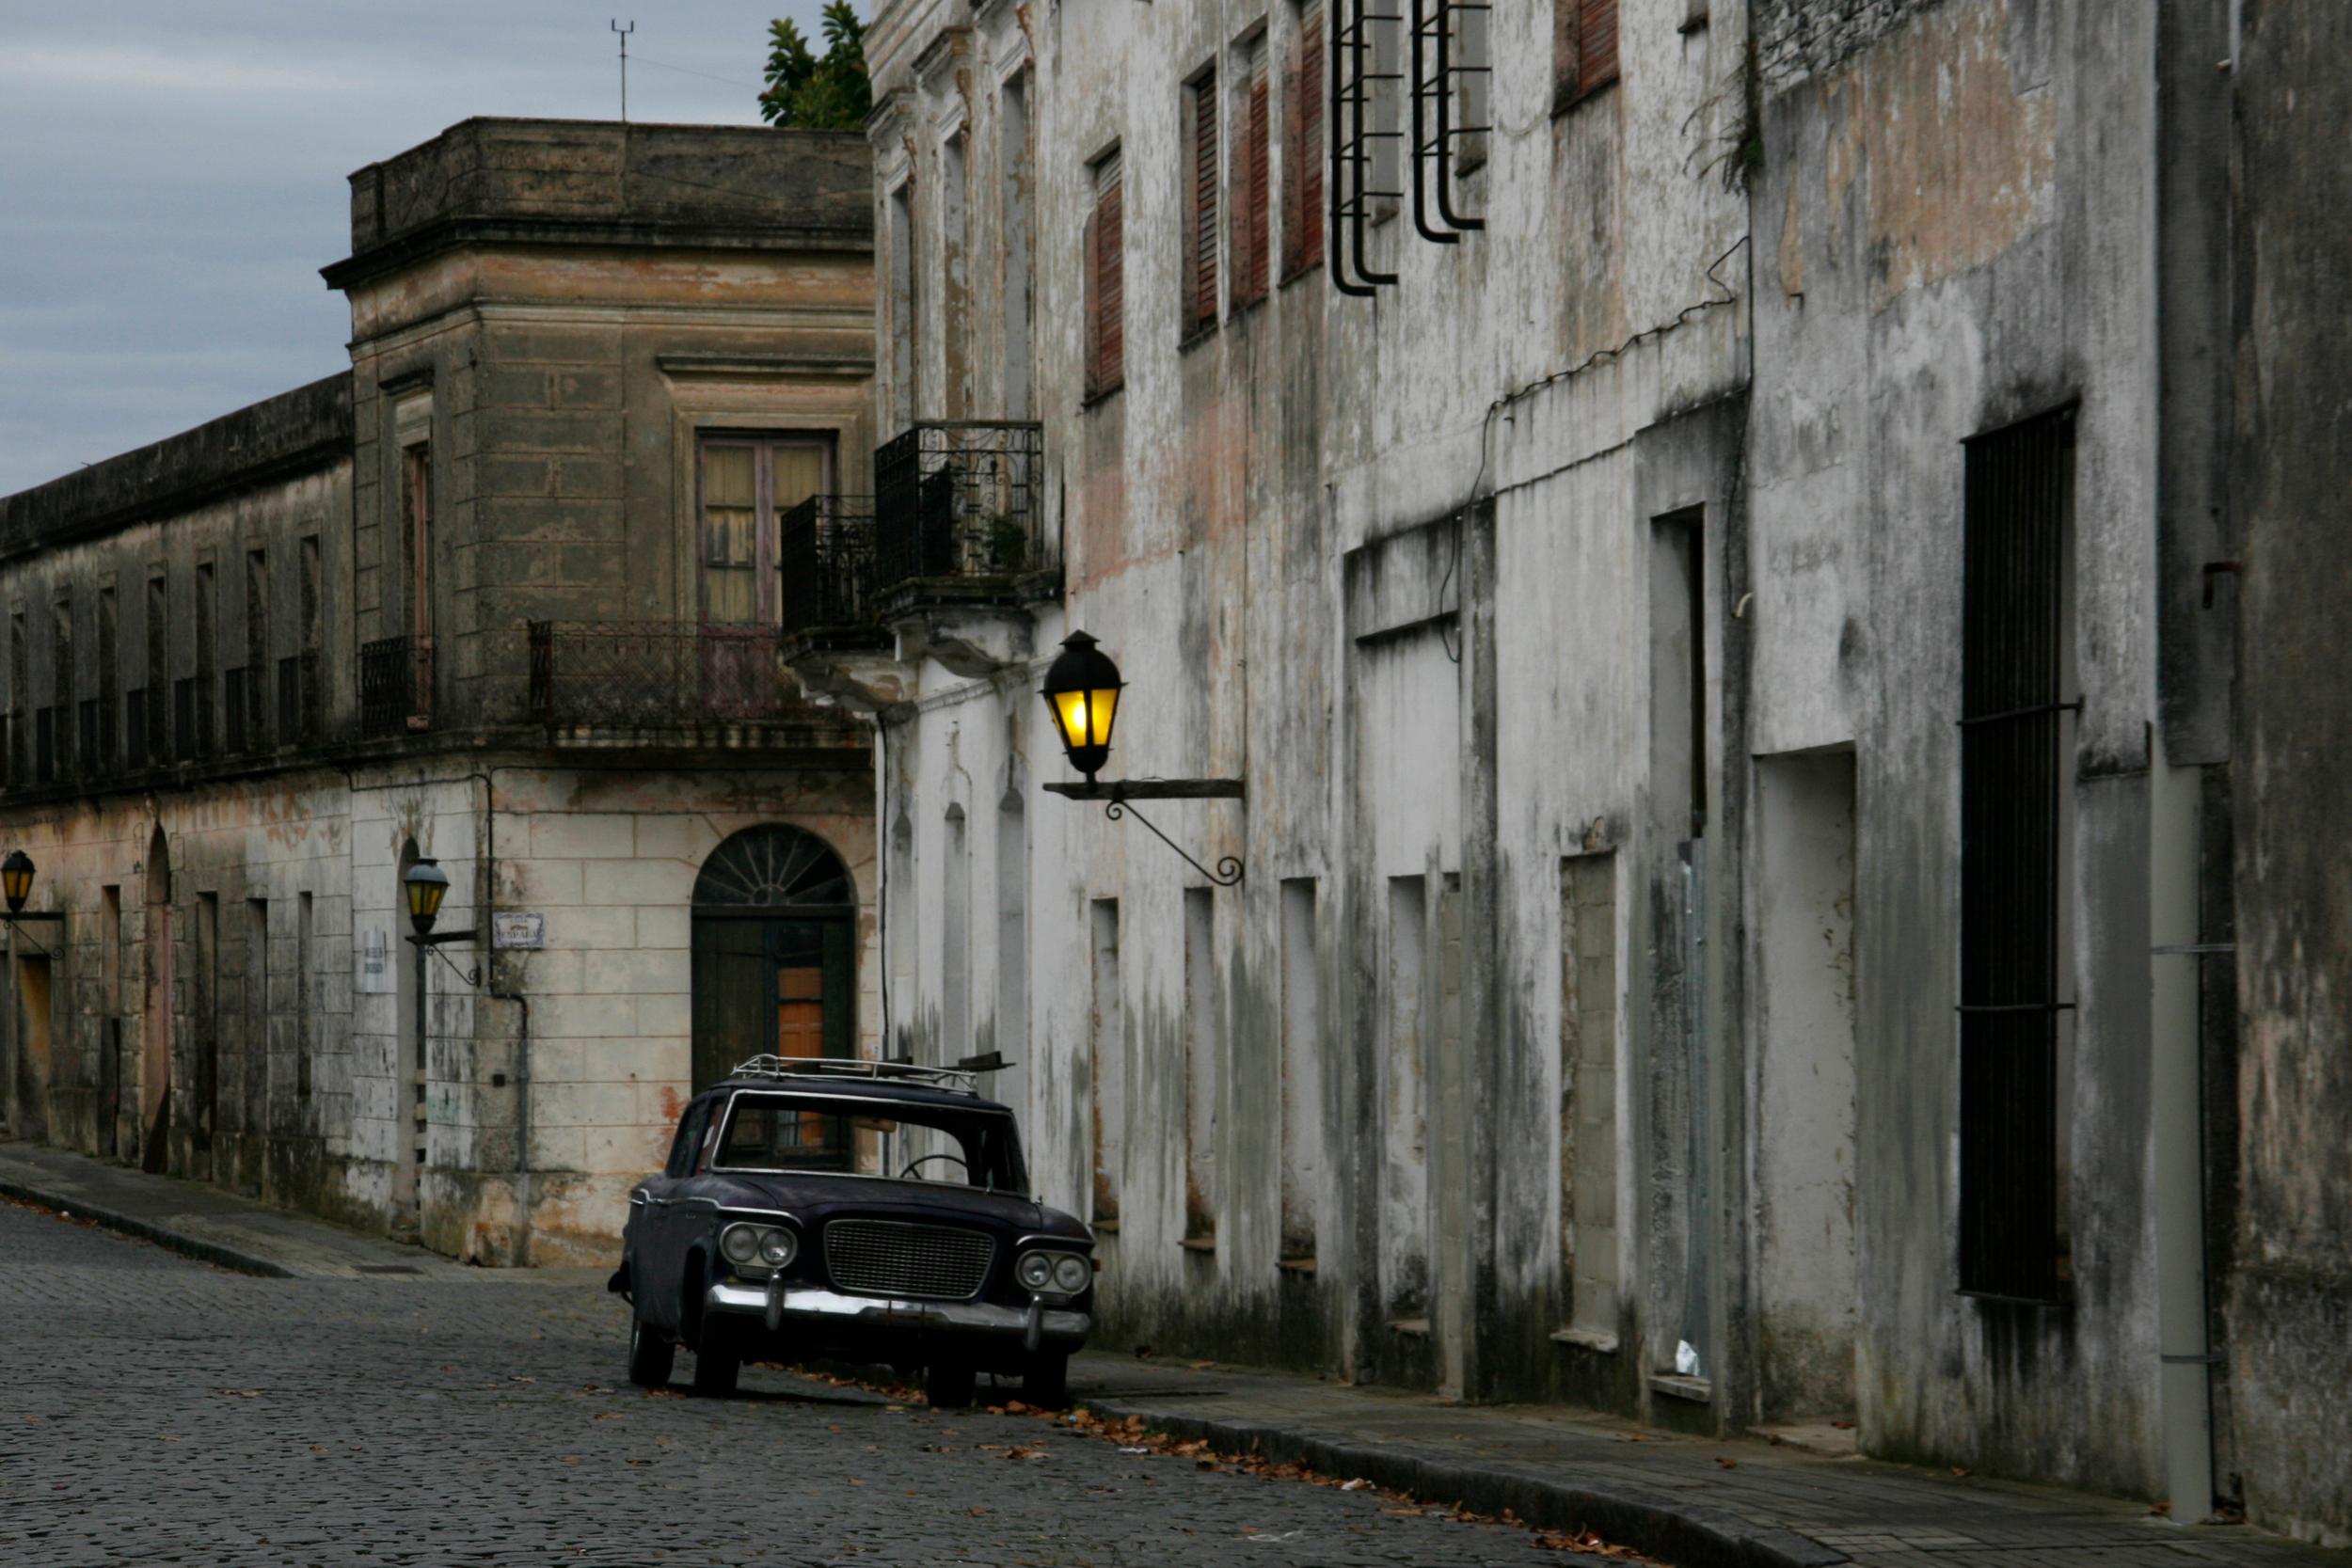 Deserted car in Colonia, Uruguay